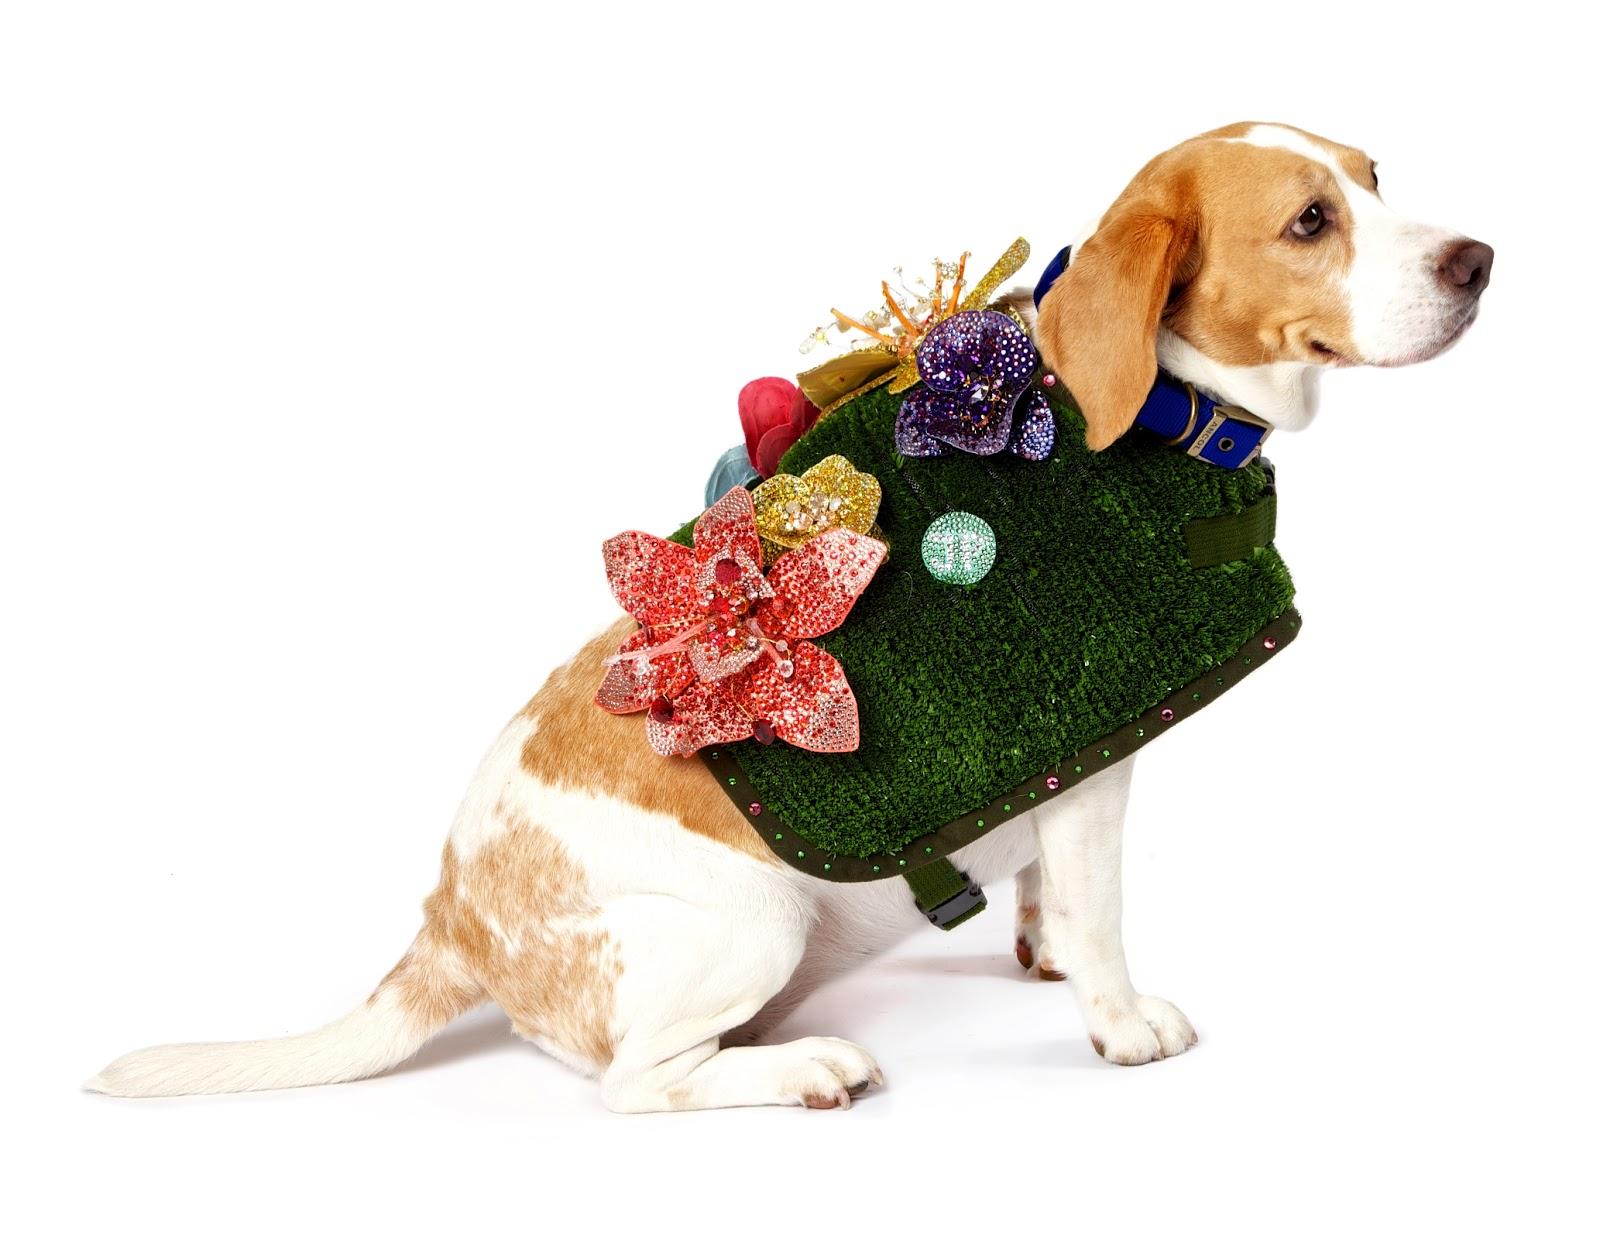 http://2.bp.blogspot.com/-IcRD3j_vBRg/UIAdnbtP5GI/AAAAAAAAP9I/NAbhF05f3GI/s1600/Frankie+in+Jenny+Packham+Battersea+dogs+home+dogwalk.jpg